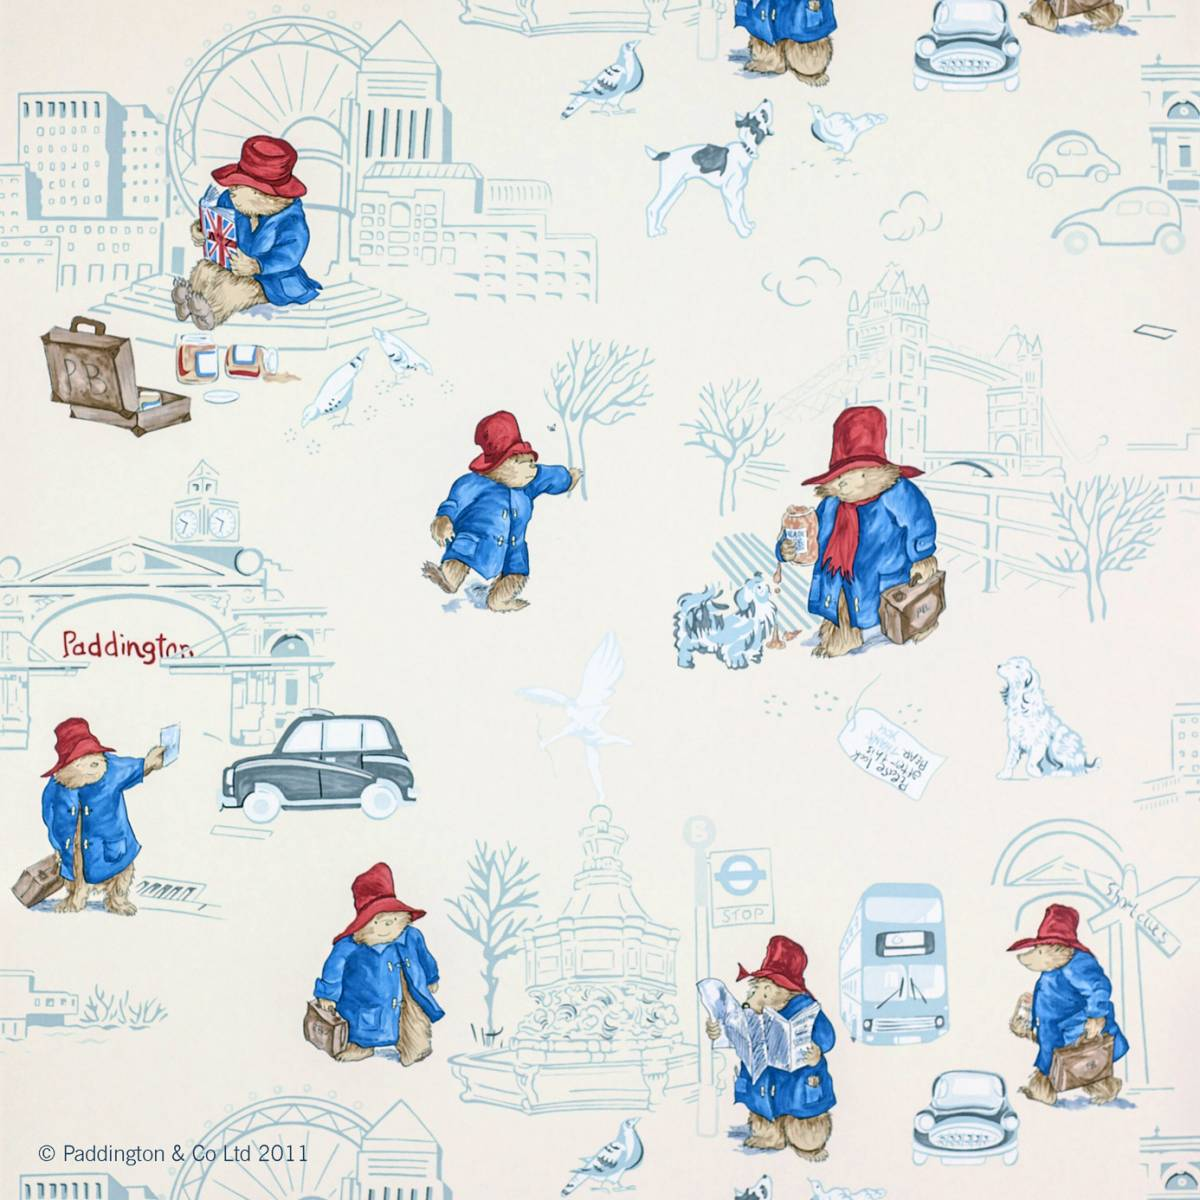 London Paddington Wallpaper Vintage Red Blue J125w 03 Jane